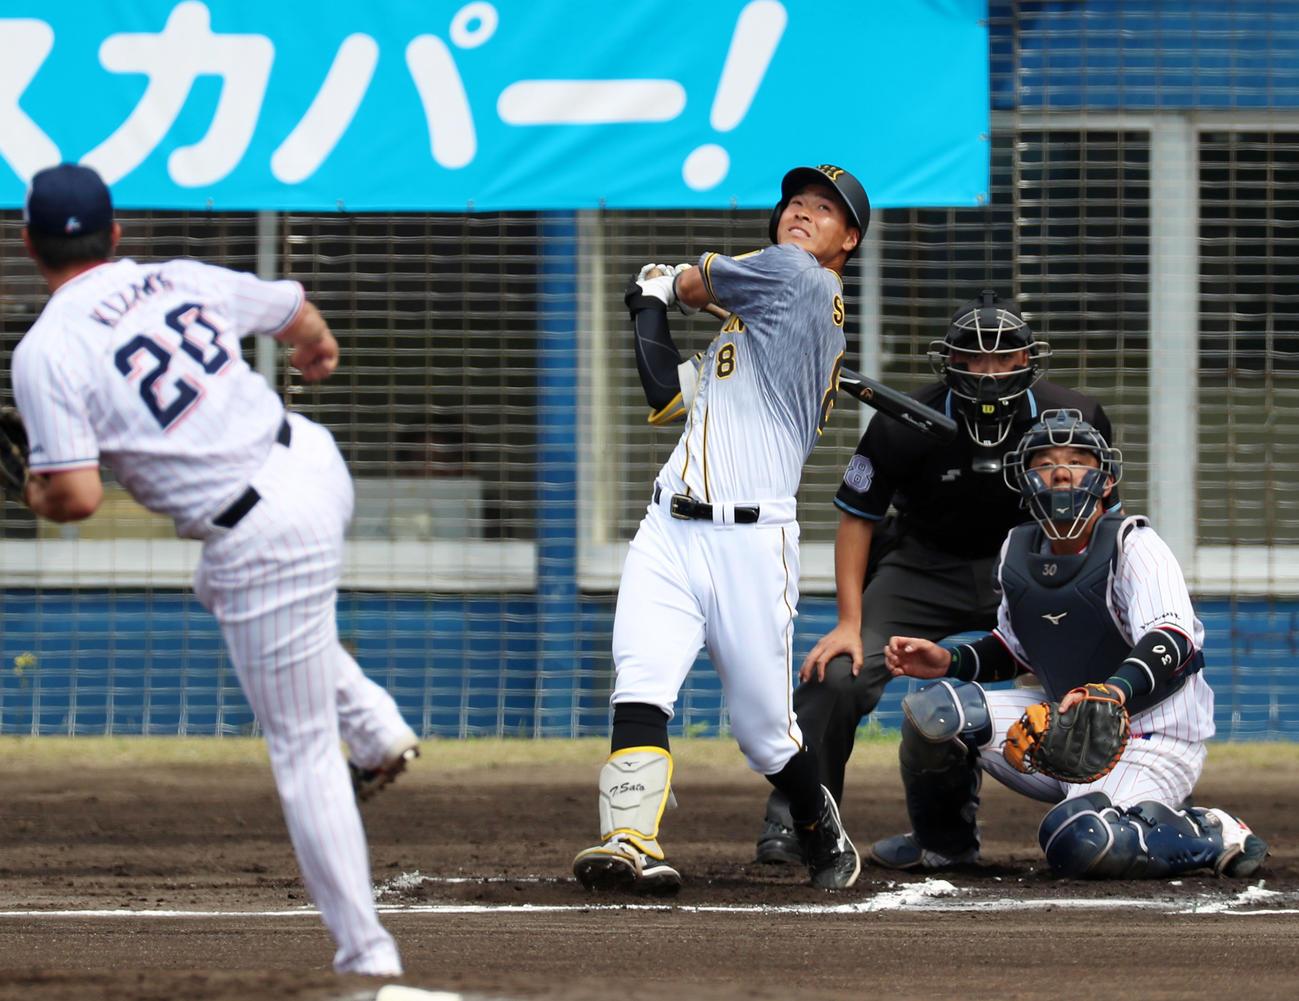 1回表阪神1死一塁、佐藤輝は左越え適時二塁打を放つ。投手は木沢(撮影・加藤哉)